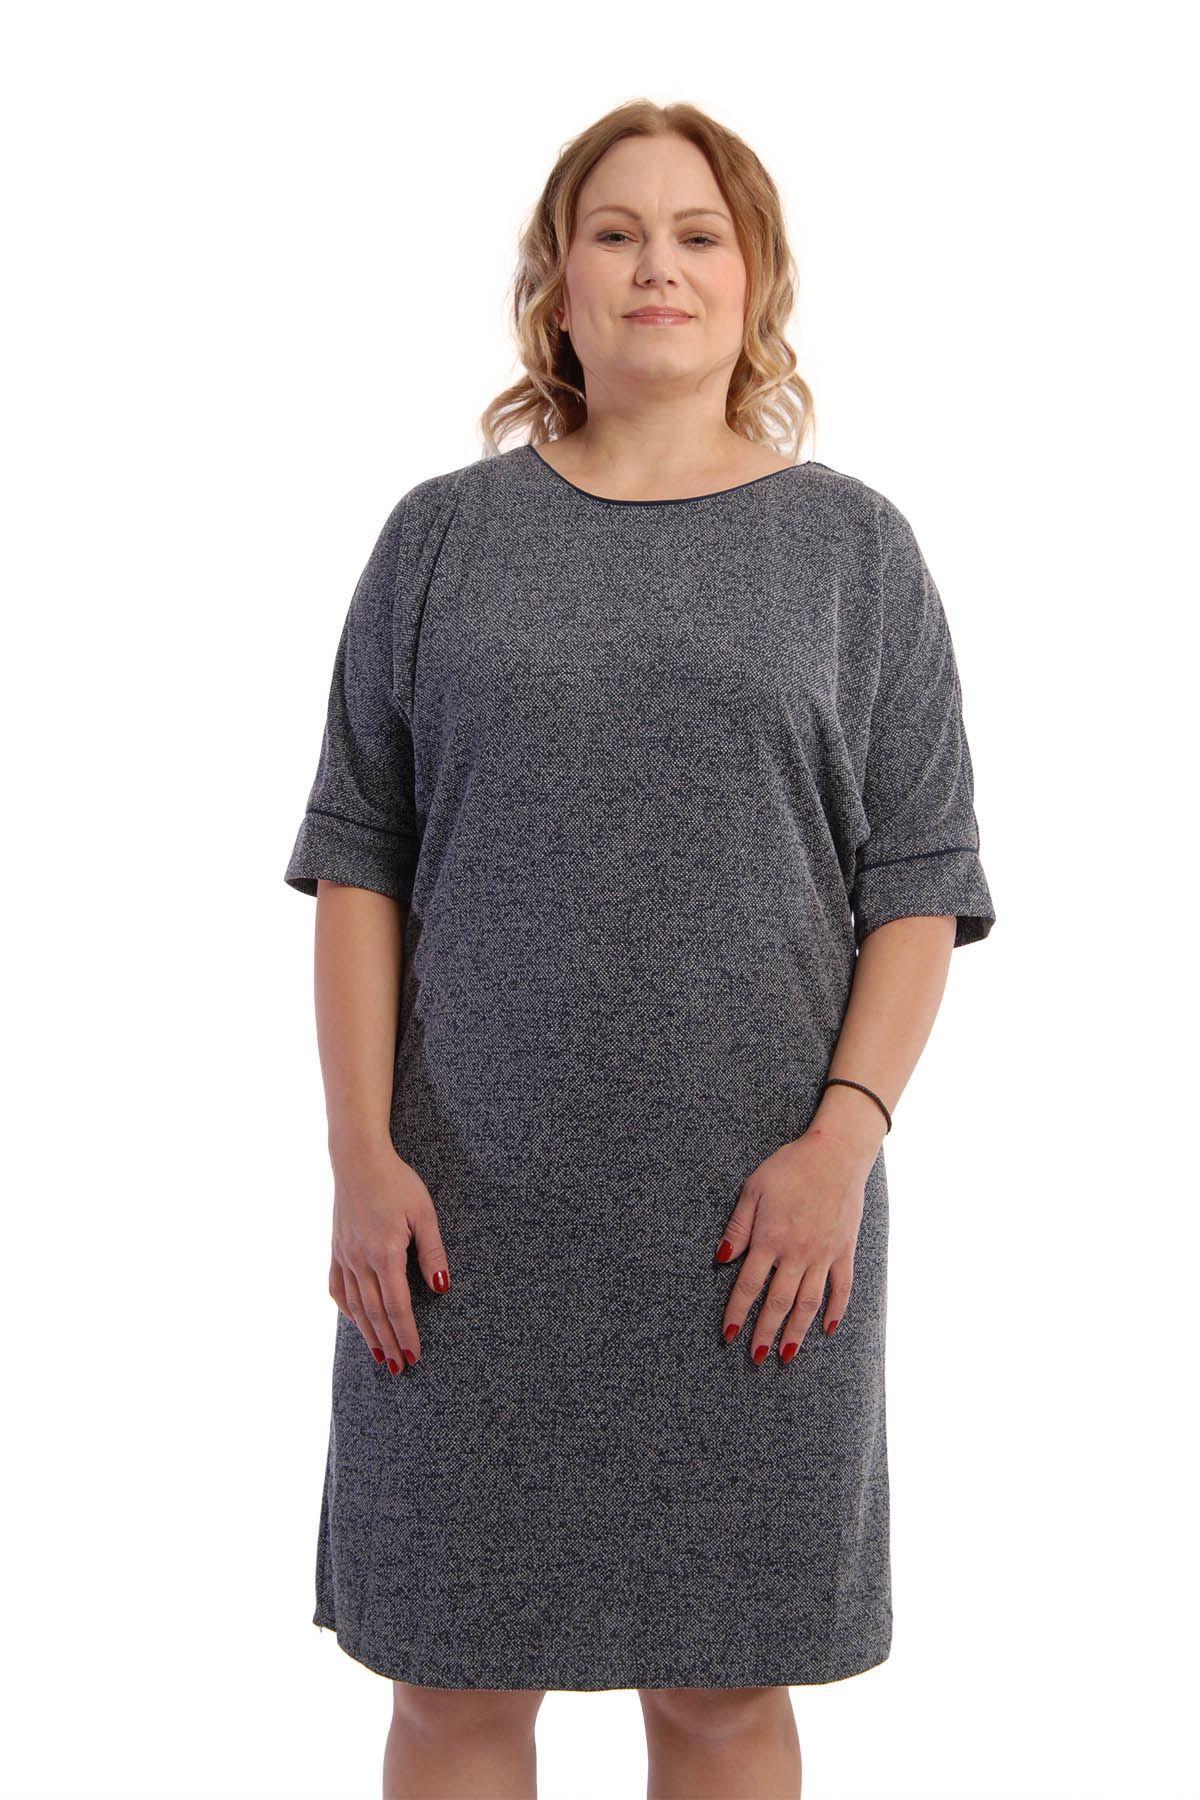 Lacivert Elbise K6-54938